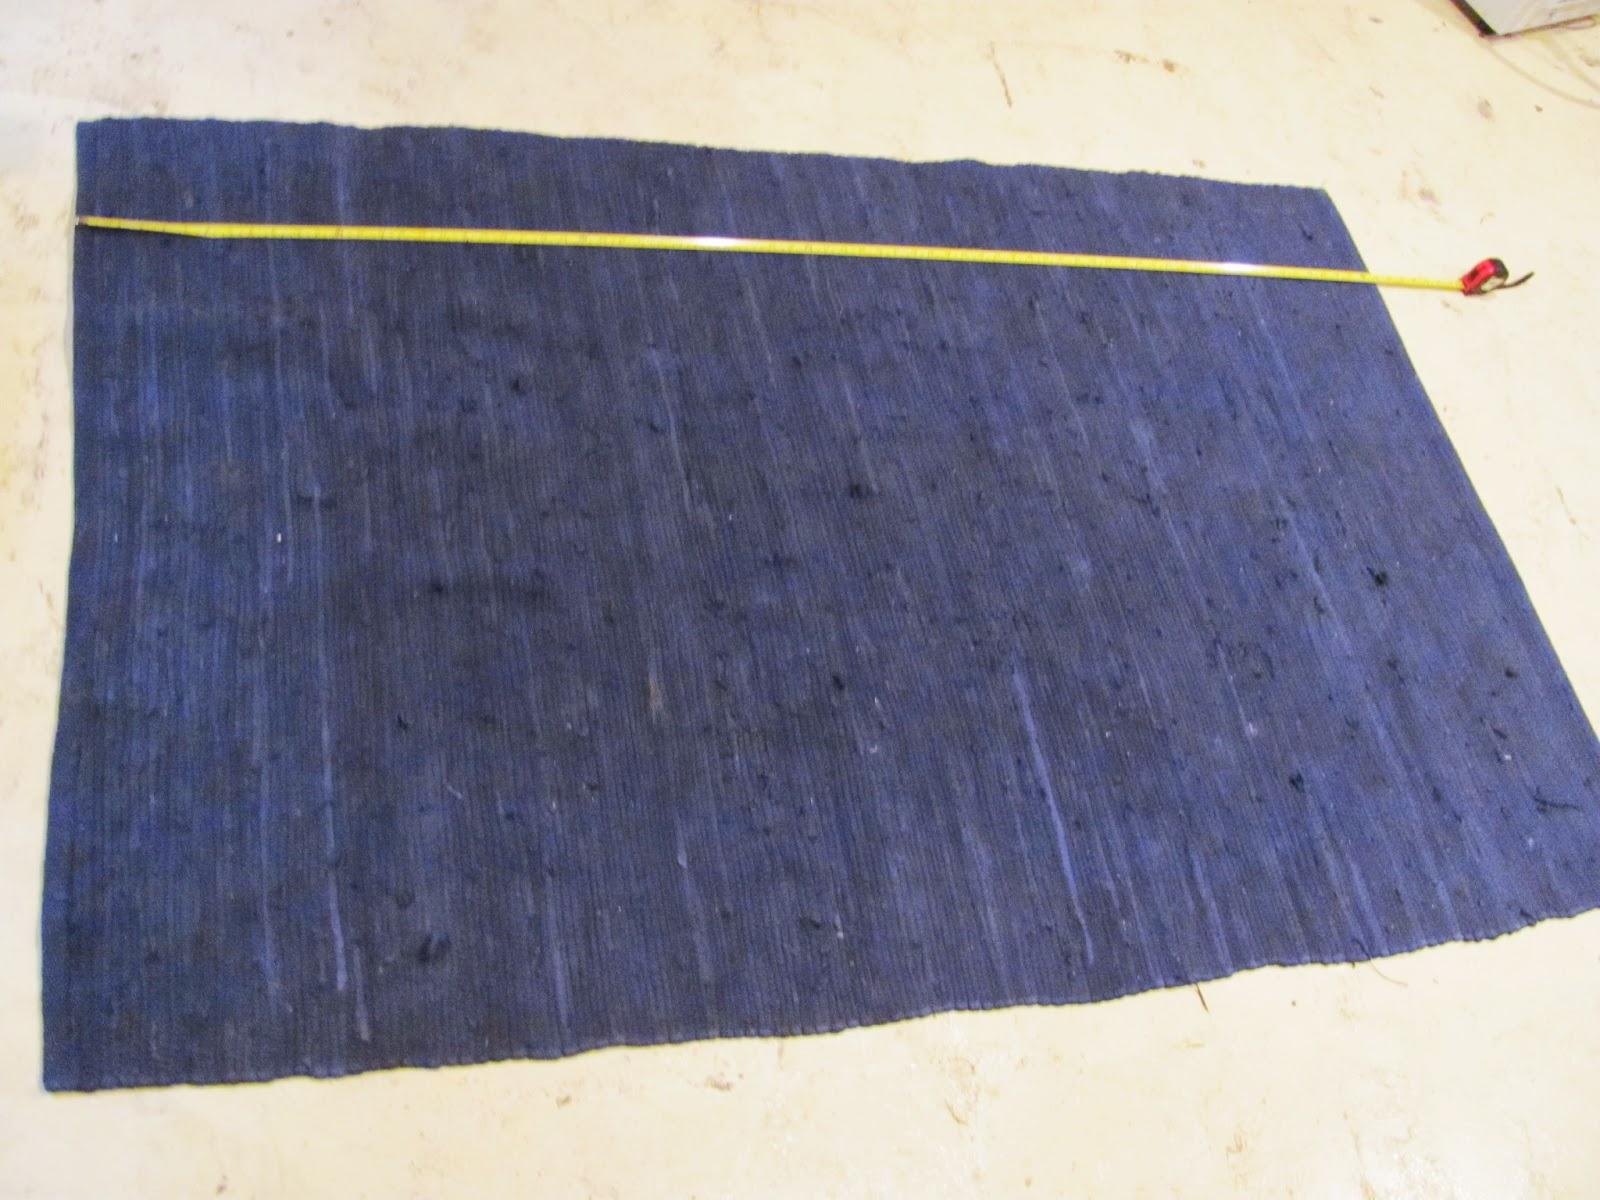 Dark blue area rug on display before being sold on Craigslist